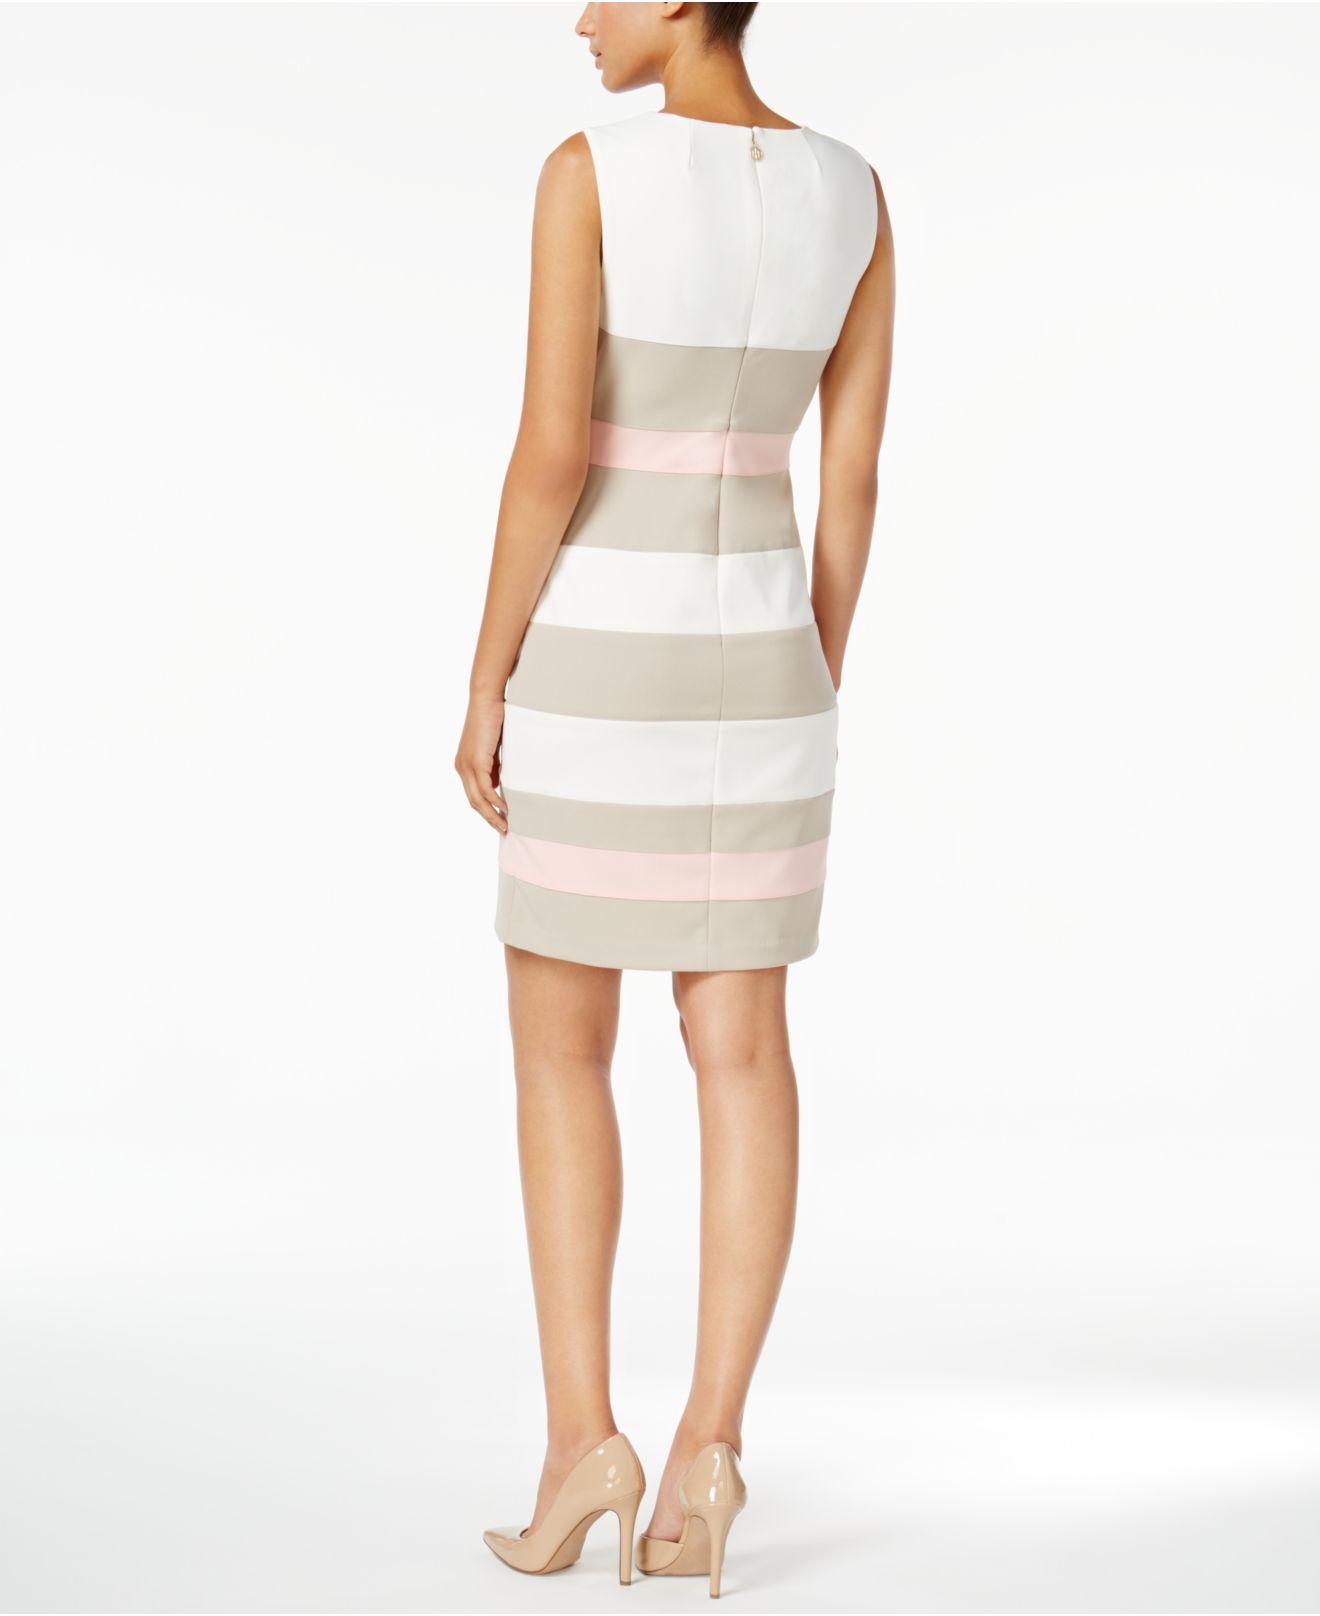 5e990cdc948 Lyst - Tommy Hilfiger Striped Scuba Sheath Dress in White - Save 16%